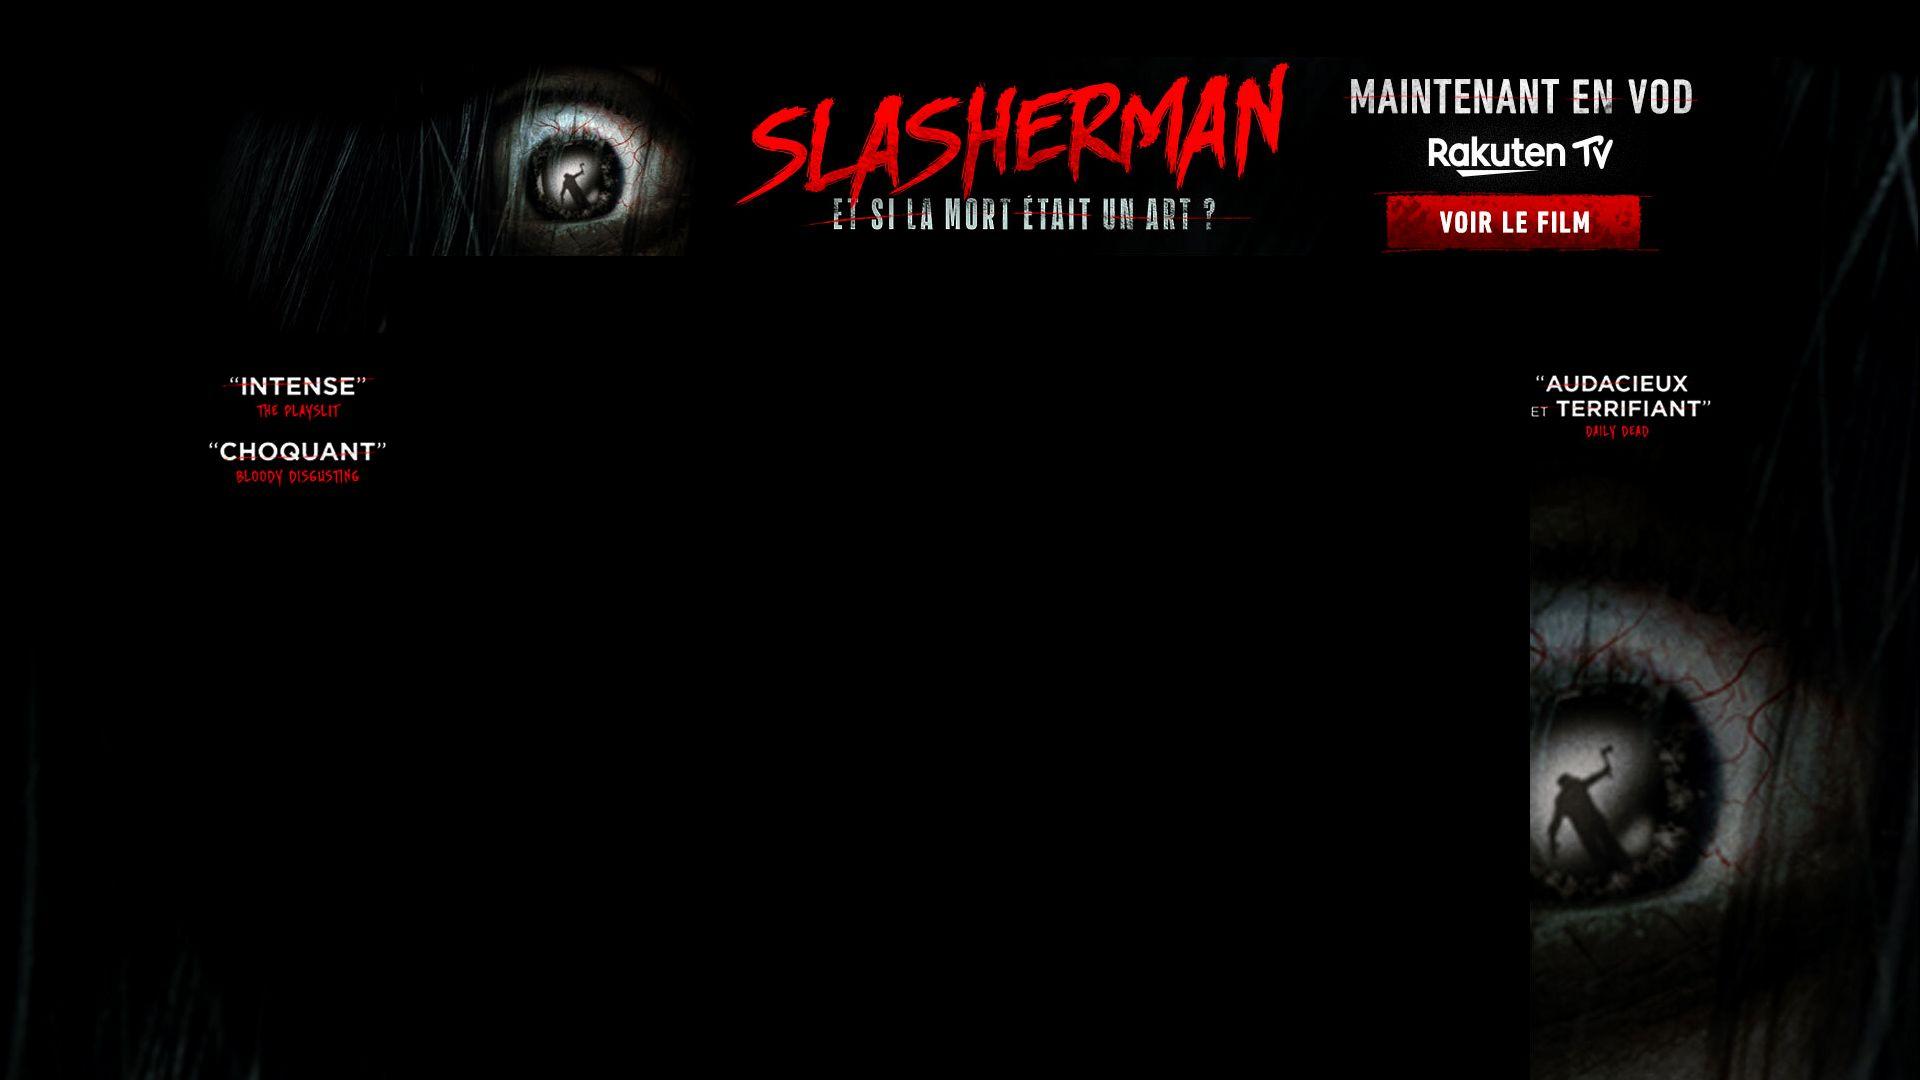 SLASHERMAN 19-23/04